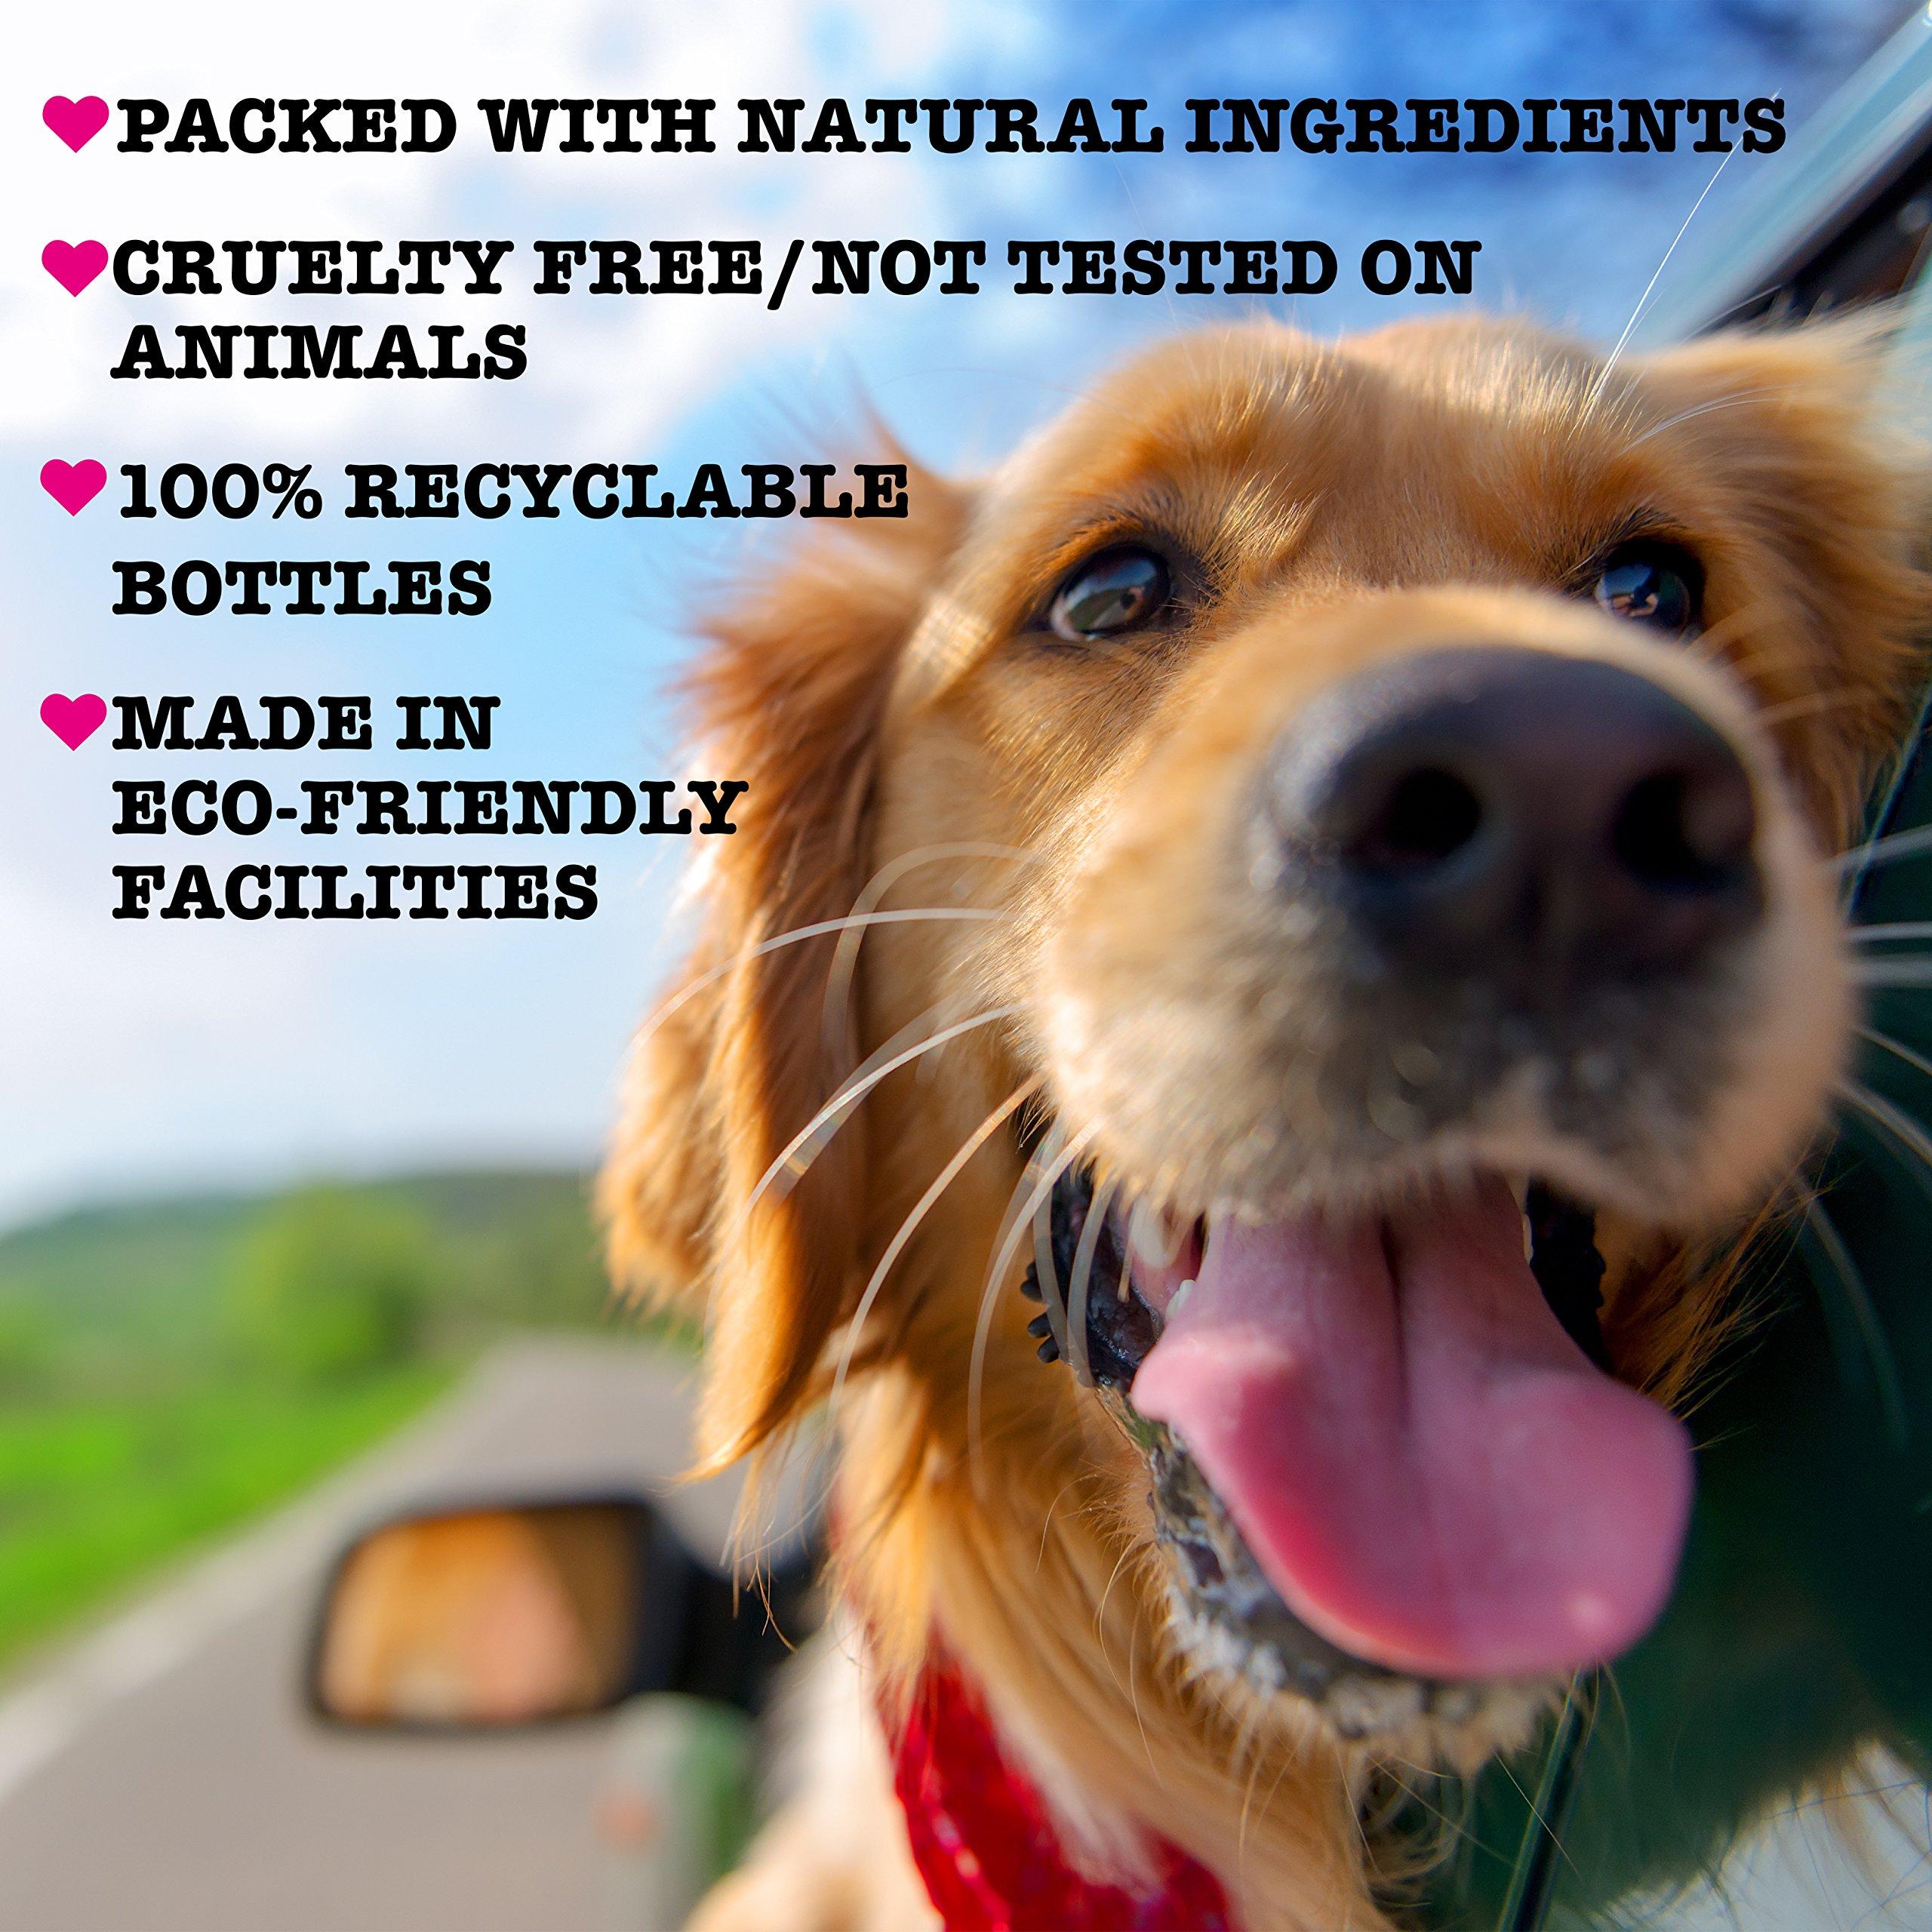 Pet Head Fur Ball Detangling Spray for Pets Strawberry Yogurt -- 15.2 fl oz by The Company of Animals (Image #6)